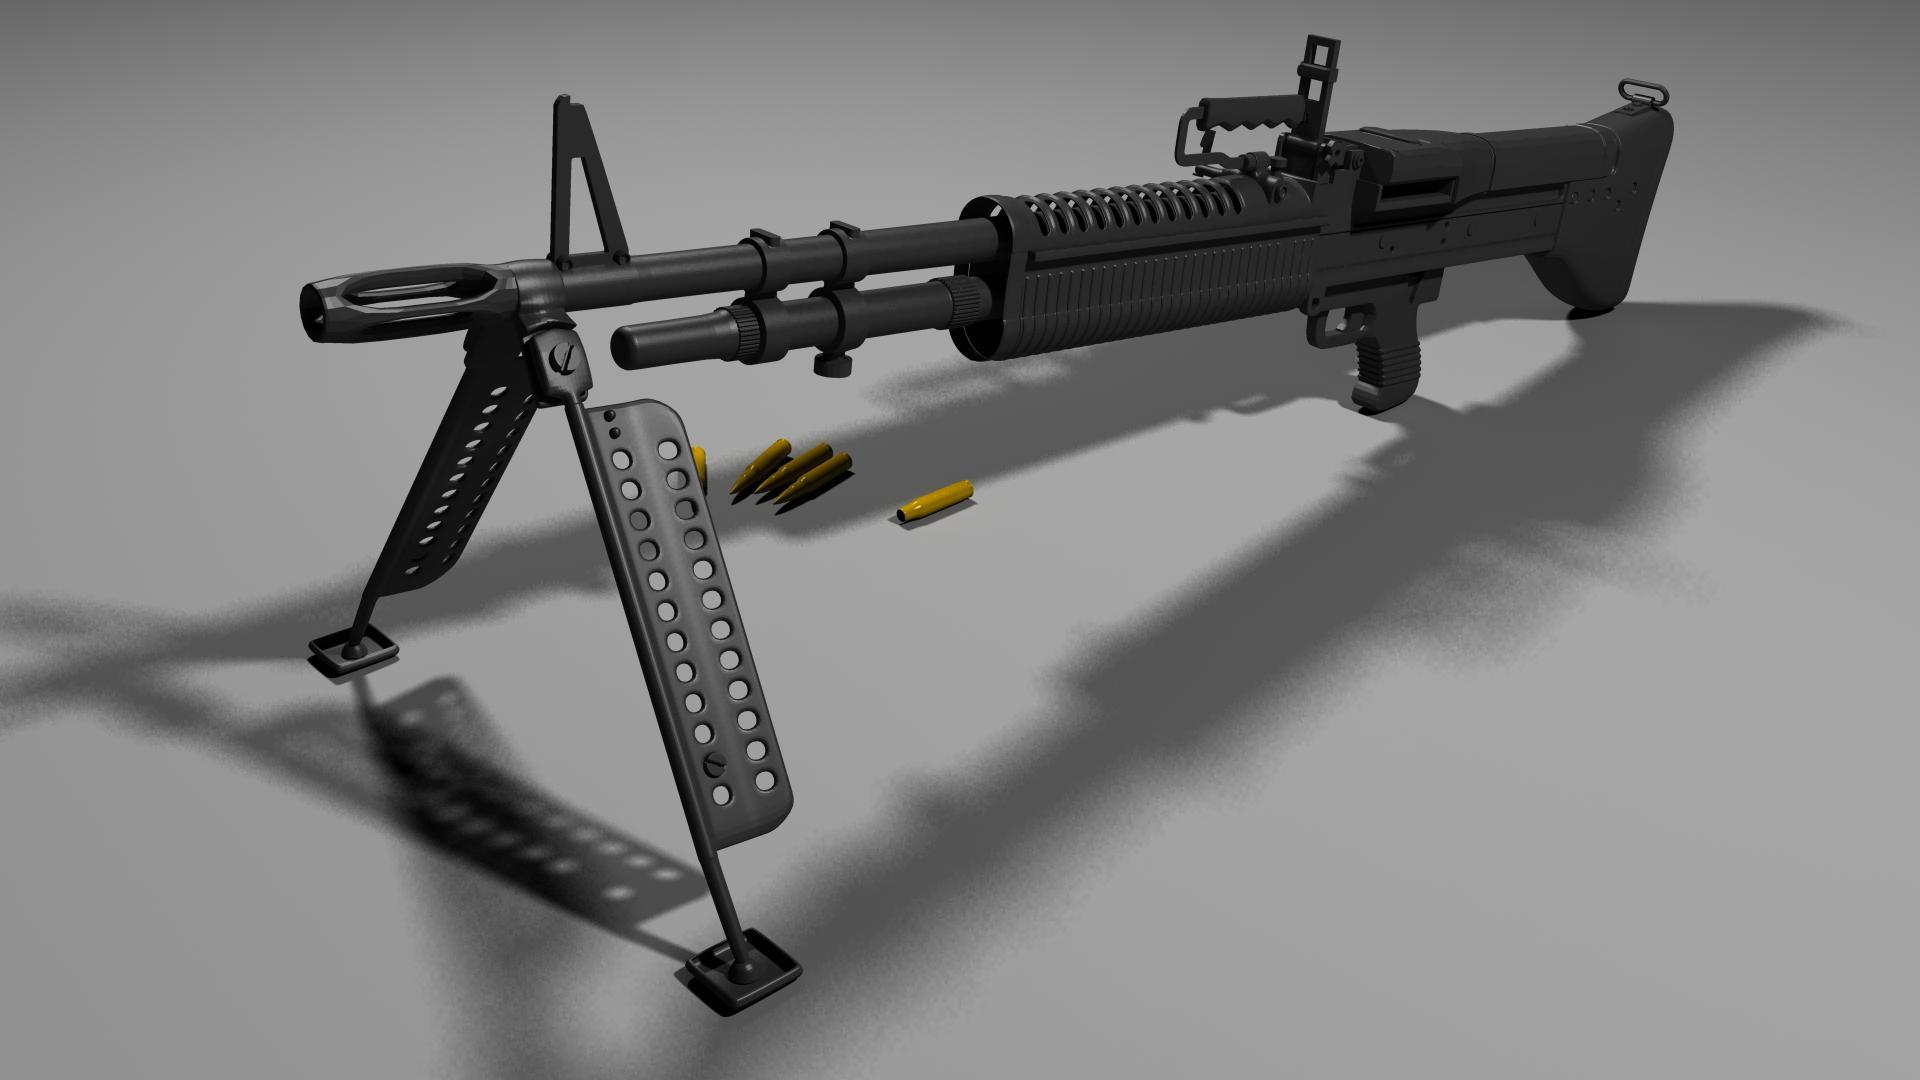 m60 machine gun - photo #27